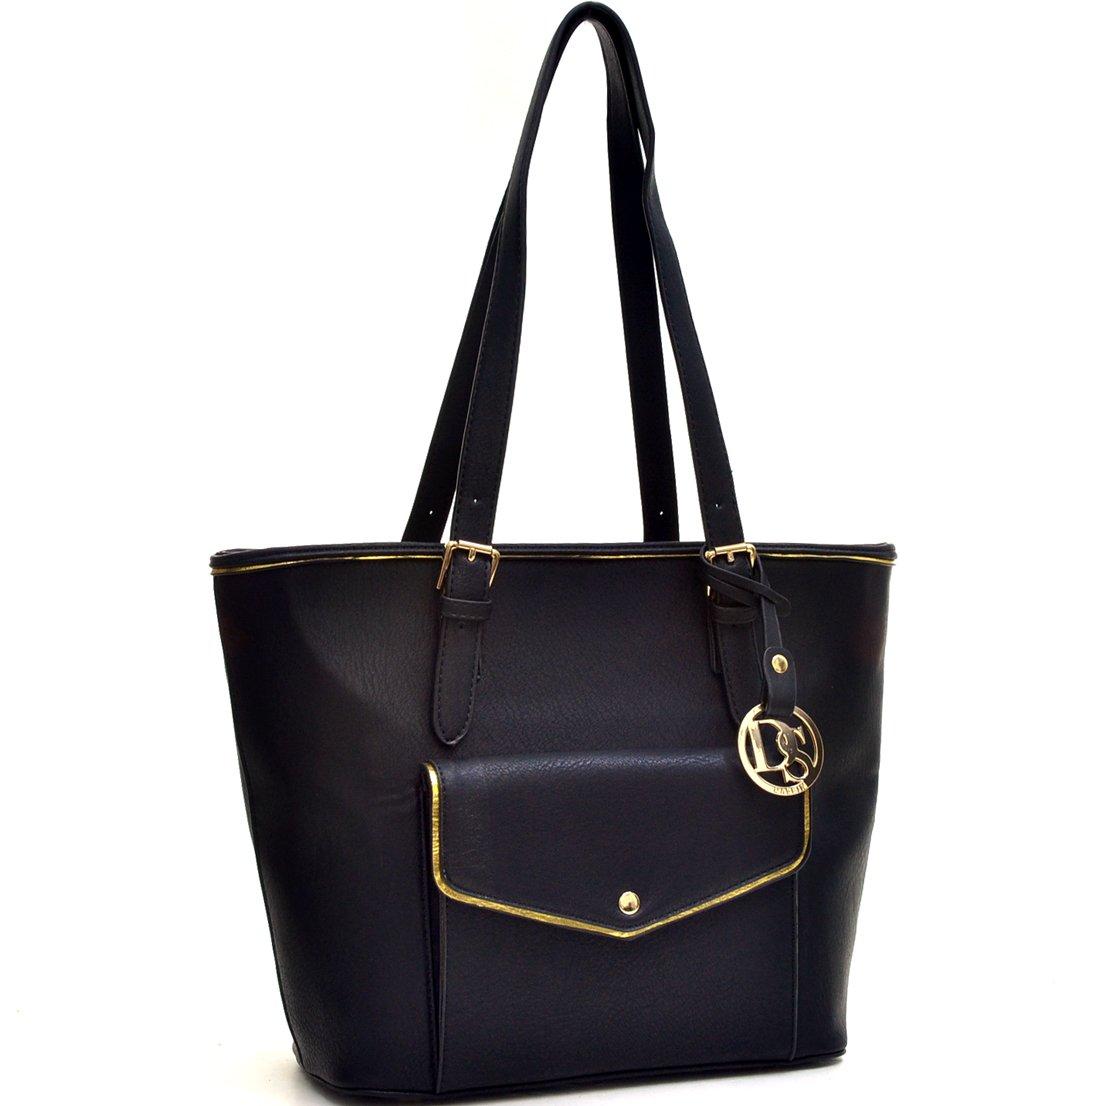 Dasein Women 's Large Zip Top多機能バックルトートバッグショルダーバッグ財布ハンドバッグ B07BHLV8KF 6786-black 6786black